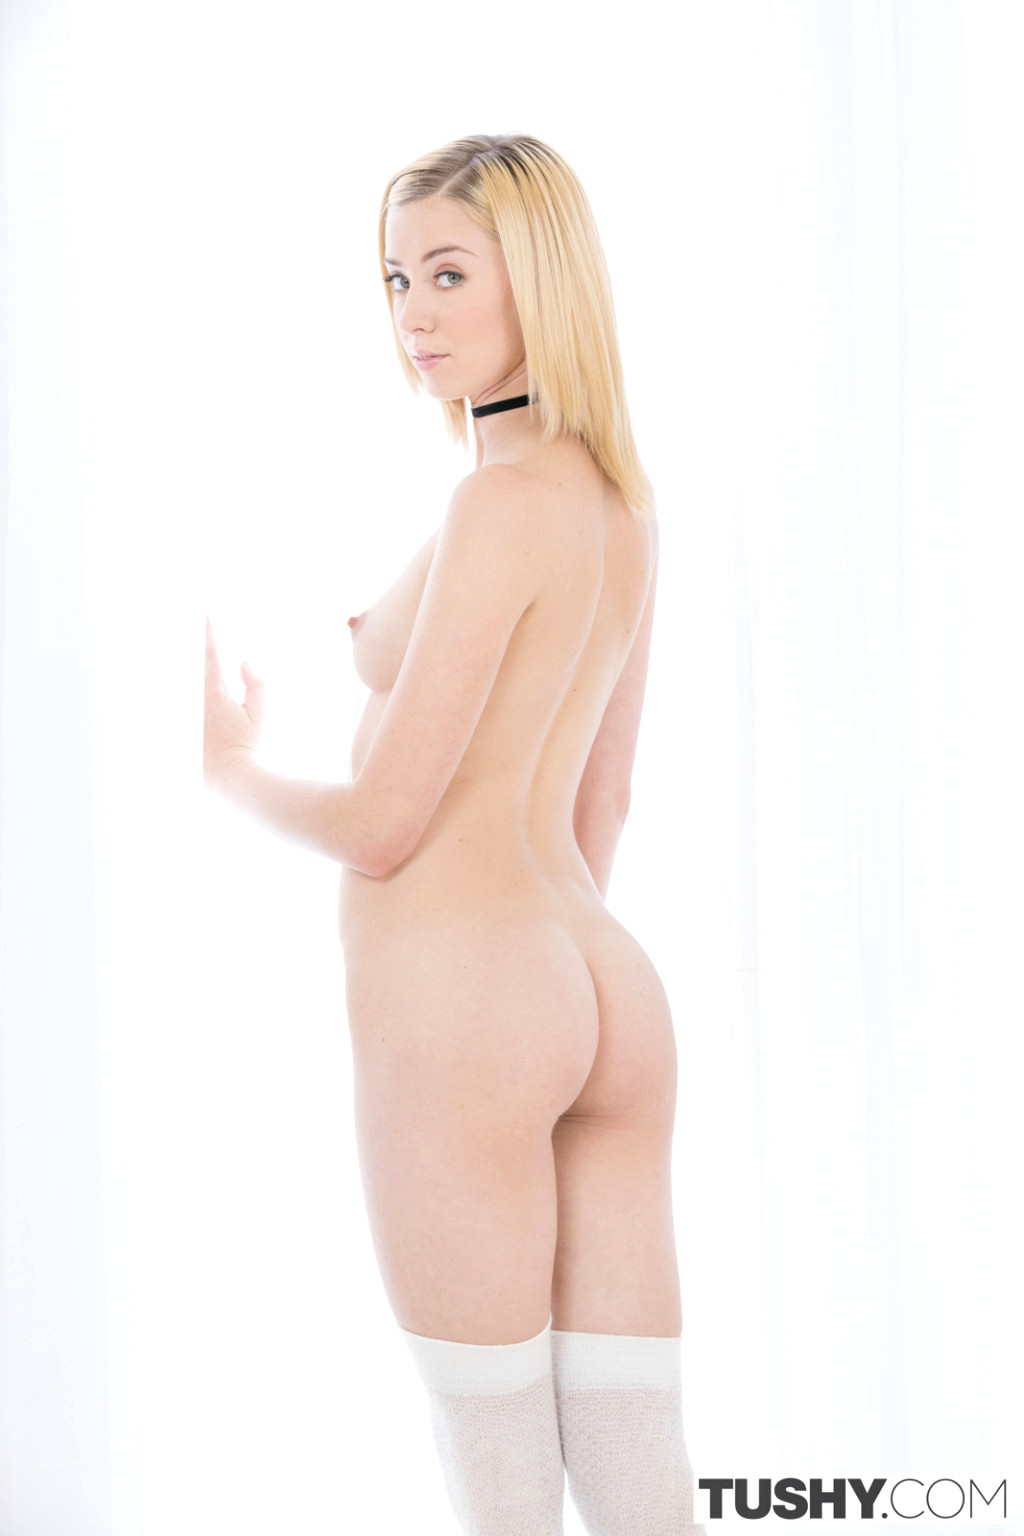 haley reed hd porn